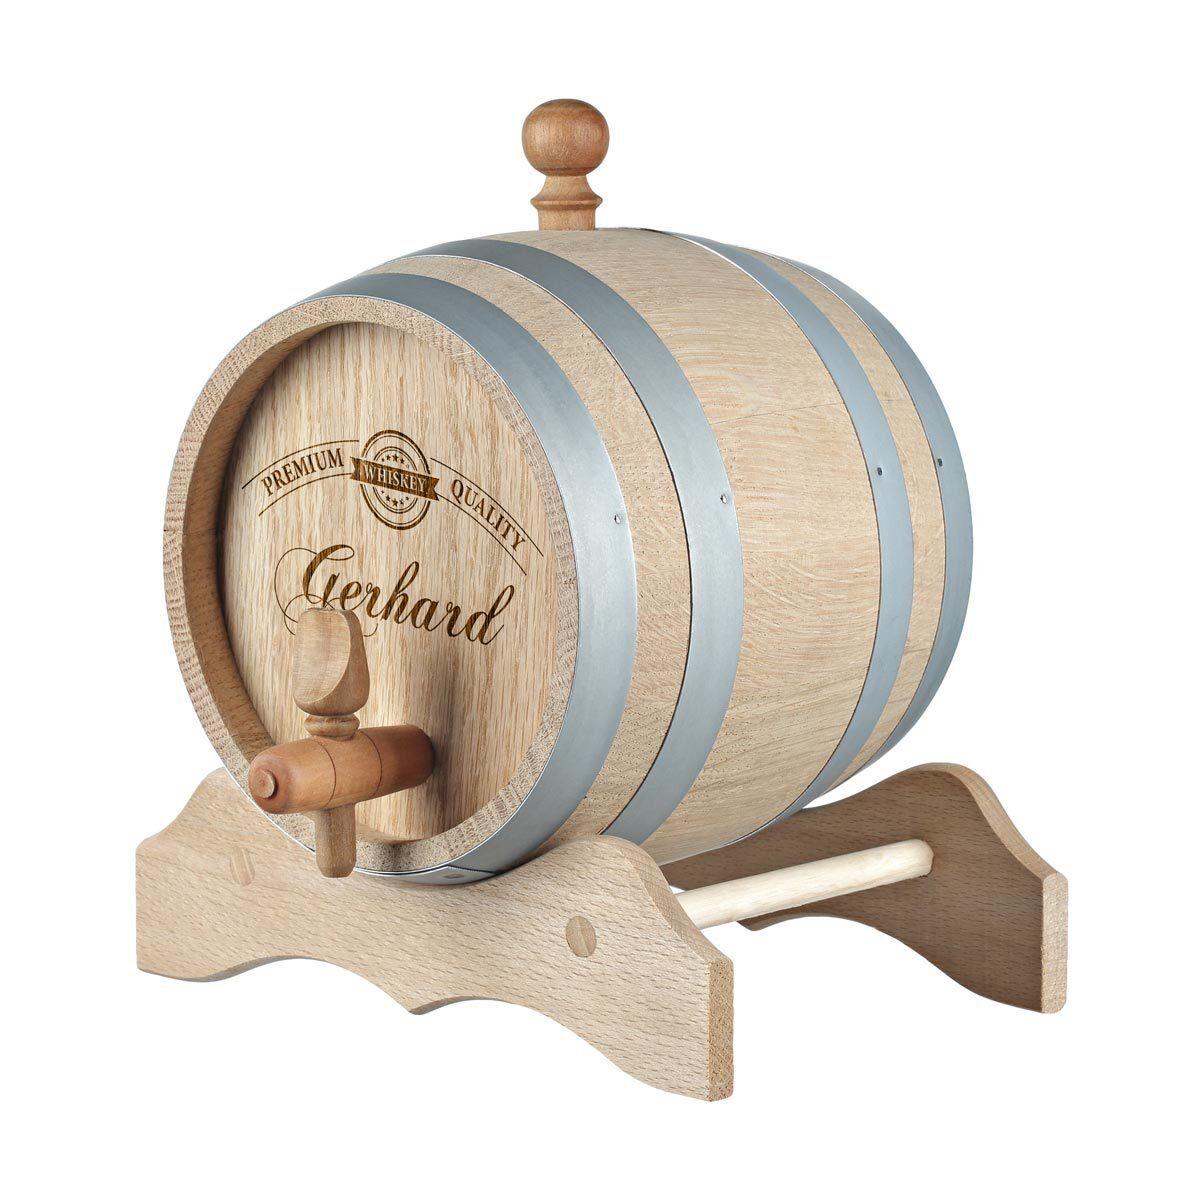 Holzfass Whiskyfass inkl. Gravur Motiv Premium label